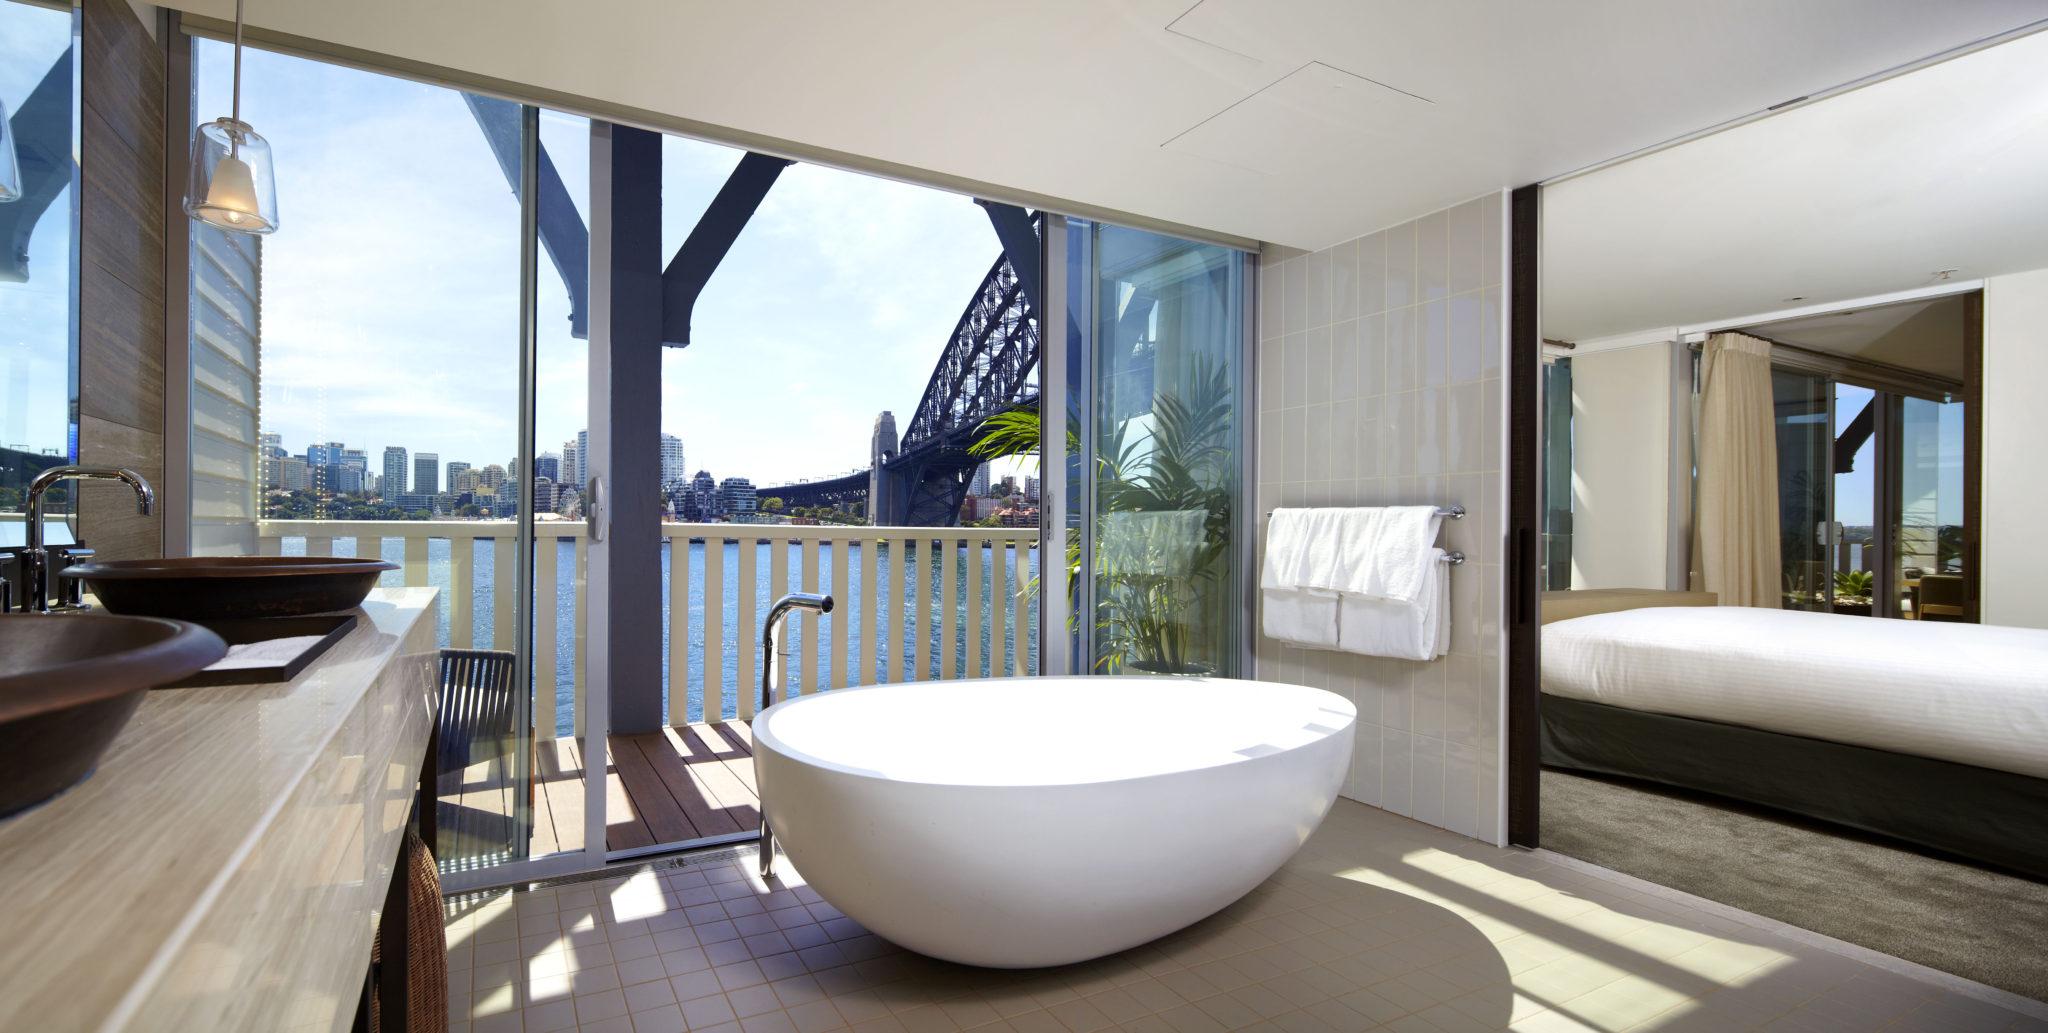 Sebel Pier One suite bath. Bath envy at the Sebel Pier One s new suites   The Interiors Addict